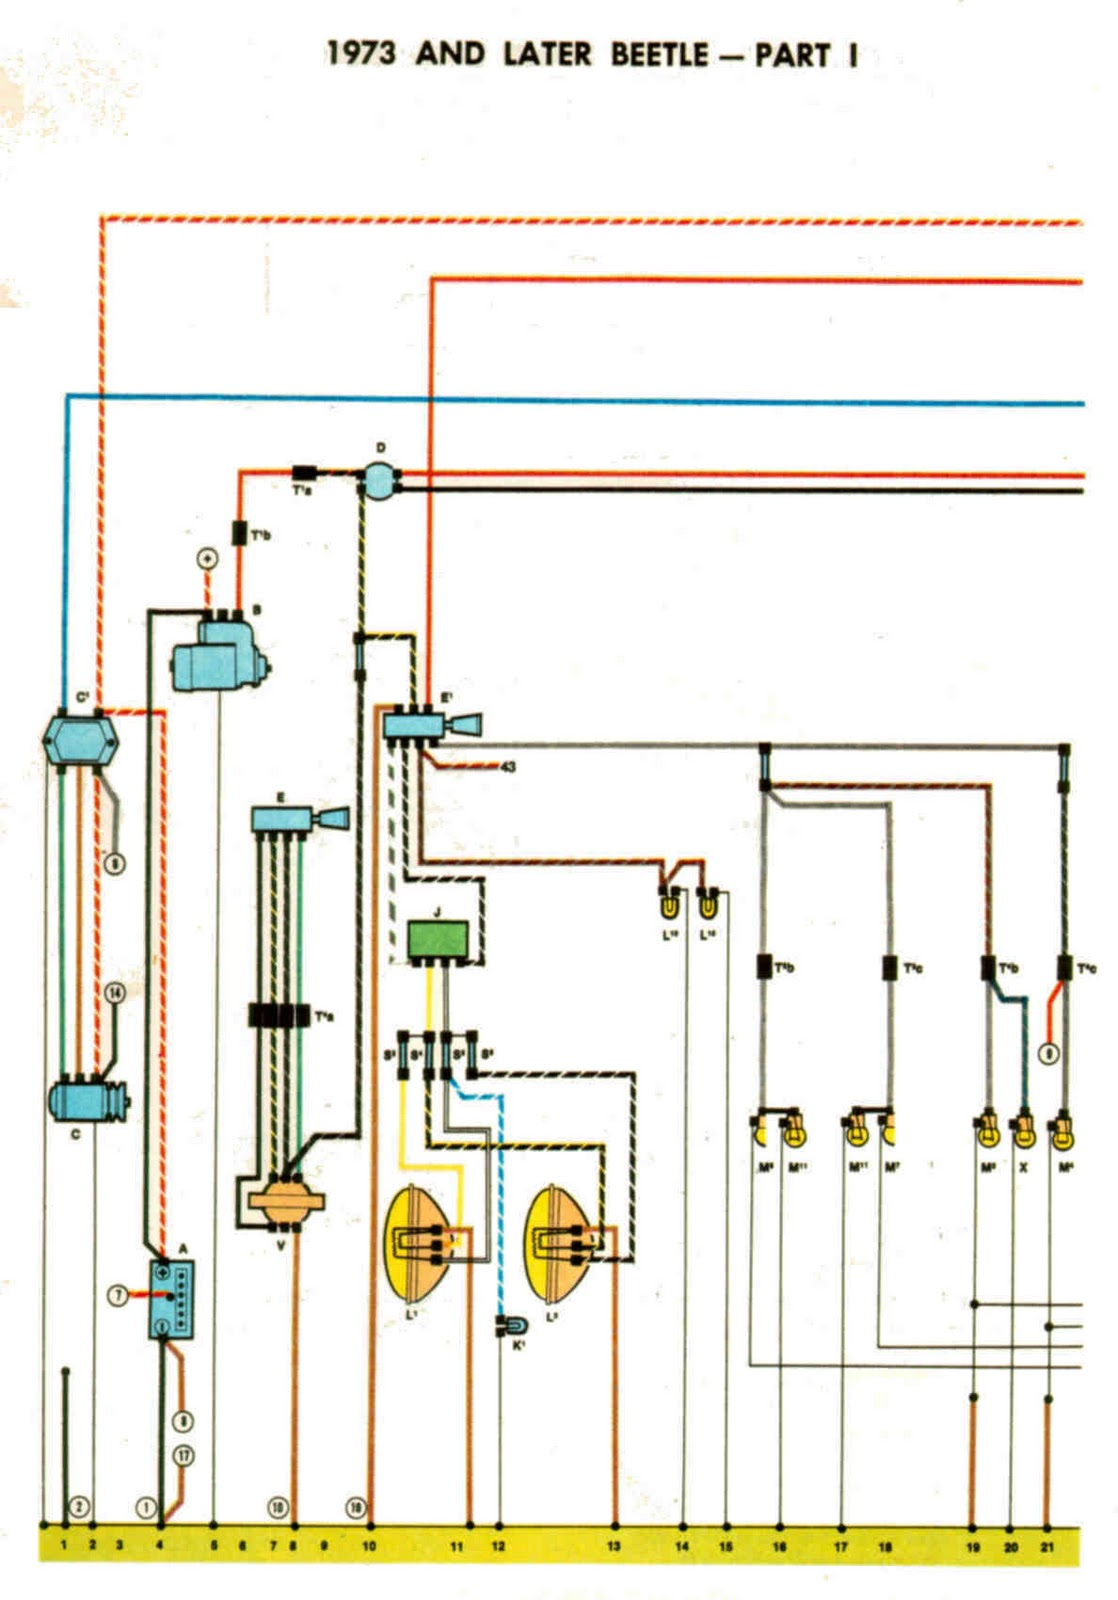 1971 Vw Beetle Turn Signal Wiring Diagram For Rim Lighting 72 Super Fuse Box Steering Column